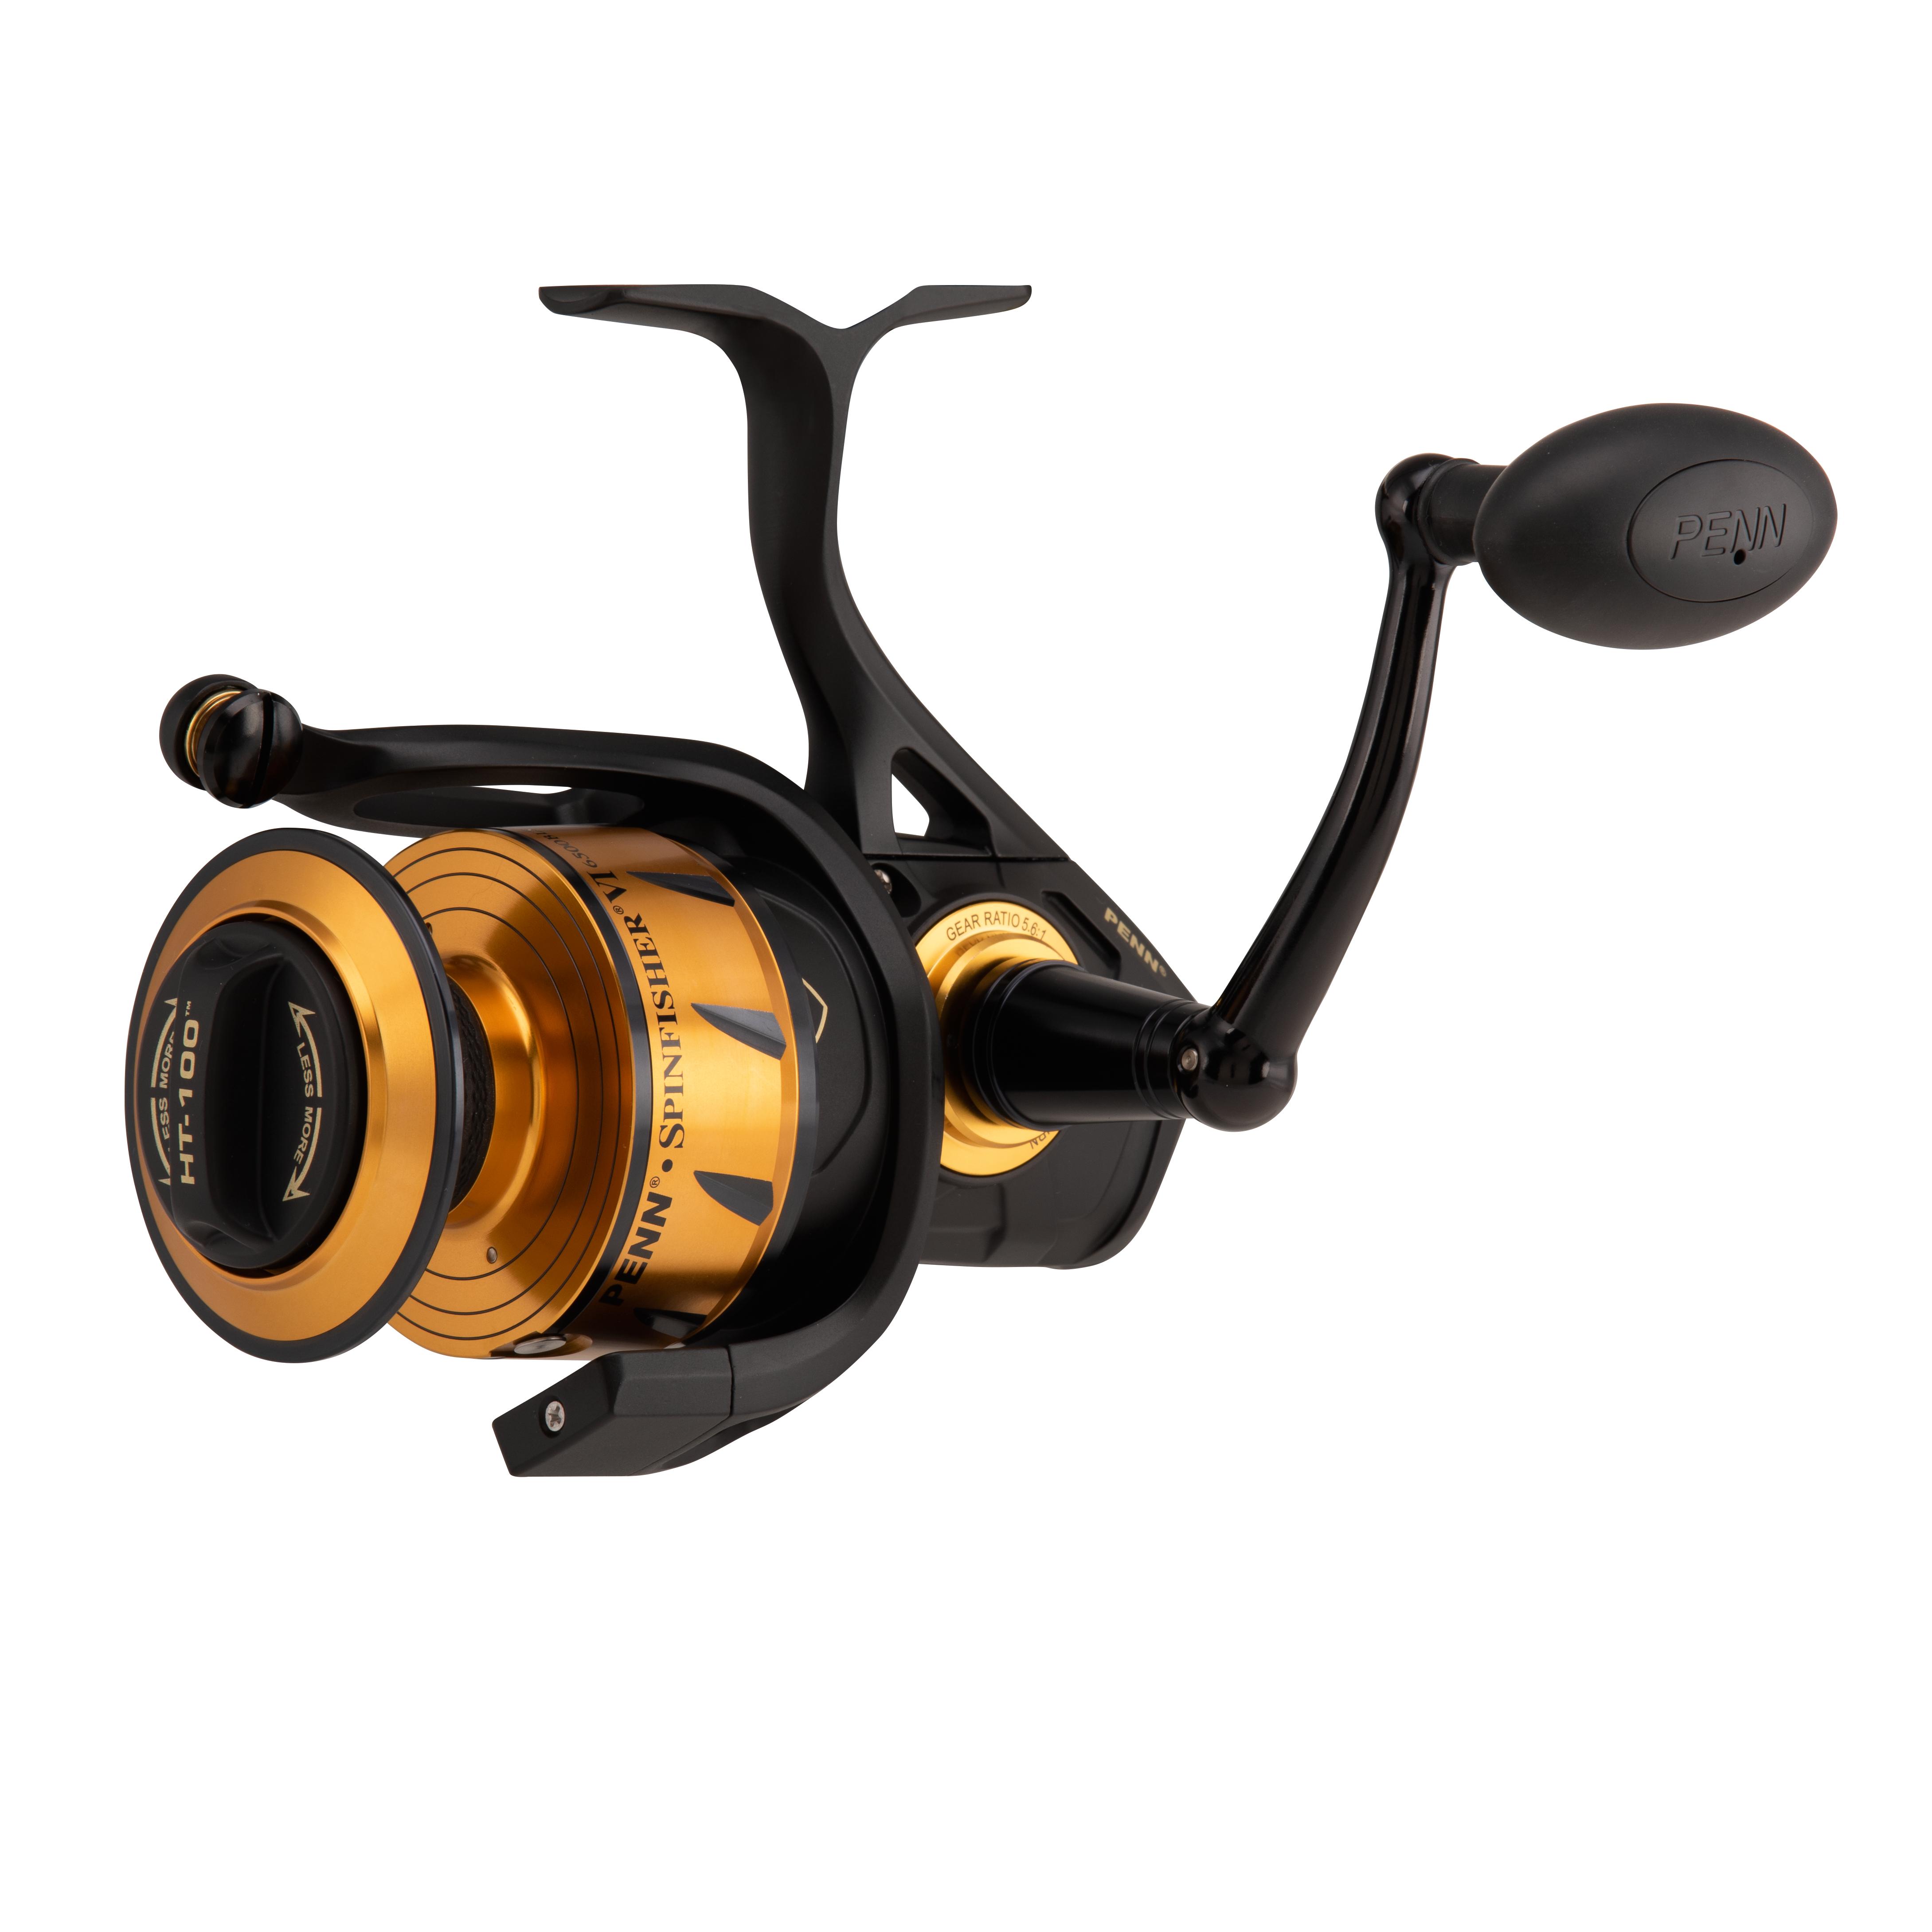 Spinning Pêche Fishing Reel FW4000 gr 5.2: 1 environ 5.44 kg 0.40//140mm poids 12 LB - 145yds